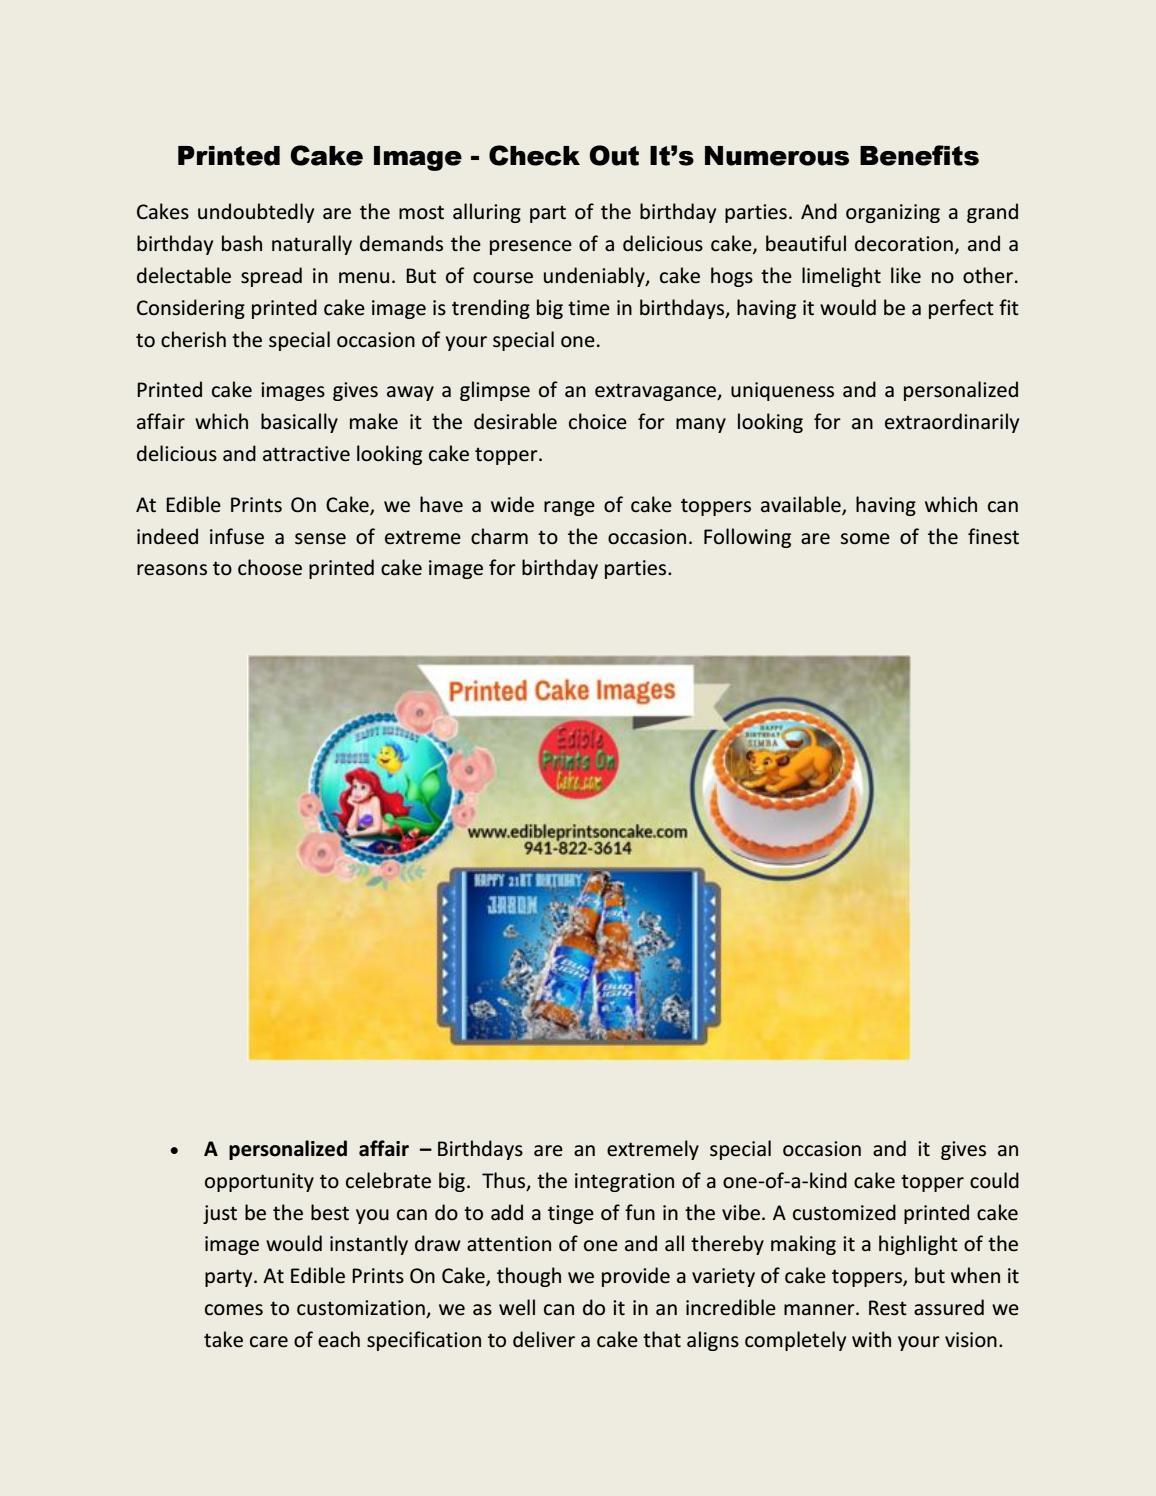 Miraculous Printed Cake Image Edible Prints On Cake Edible Birthday Cake Personalised Birthday Cards Petedlily Jamesorg